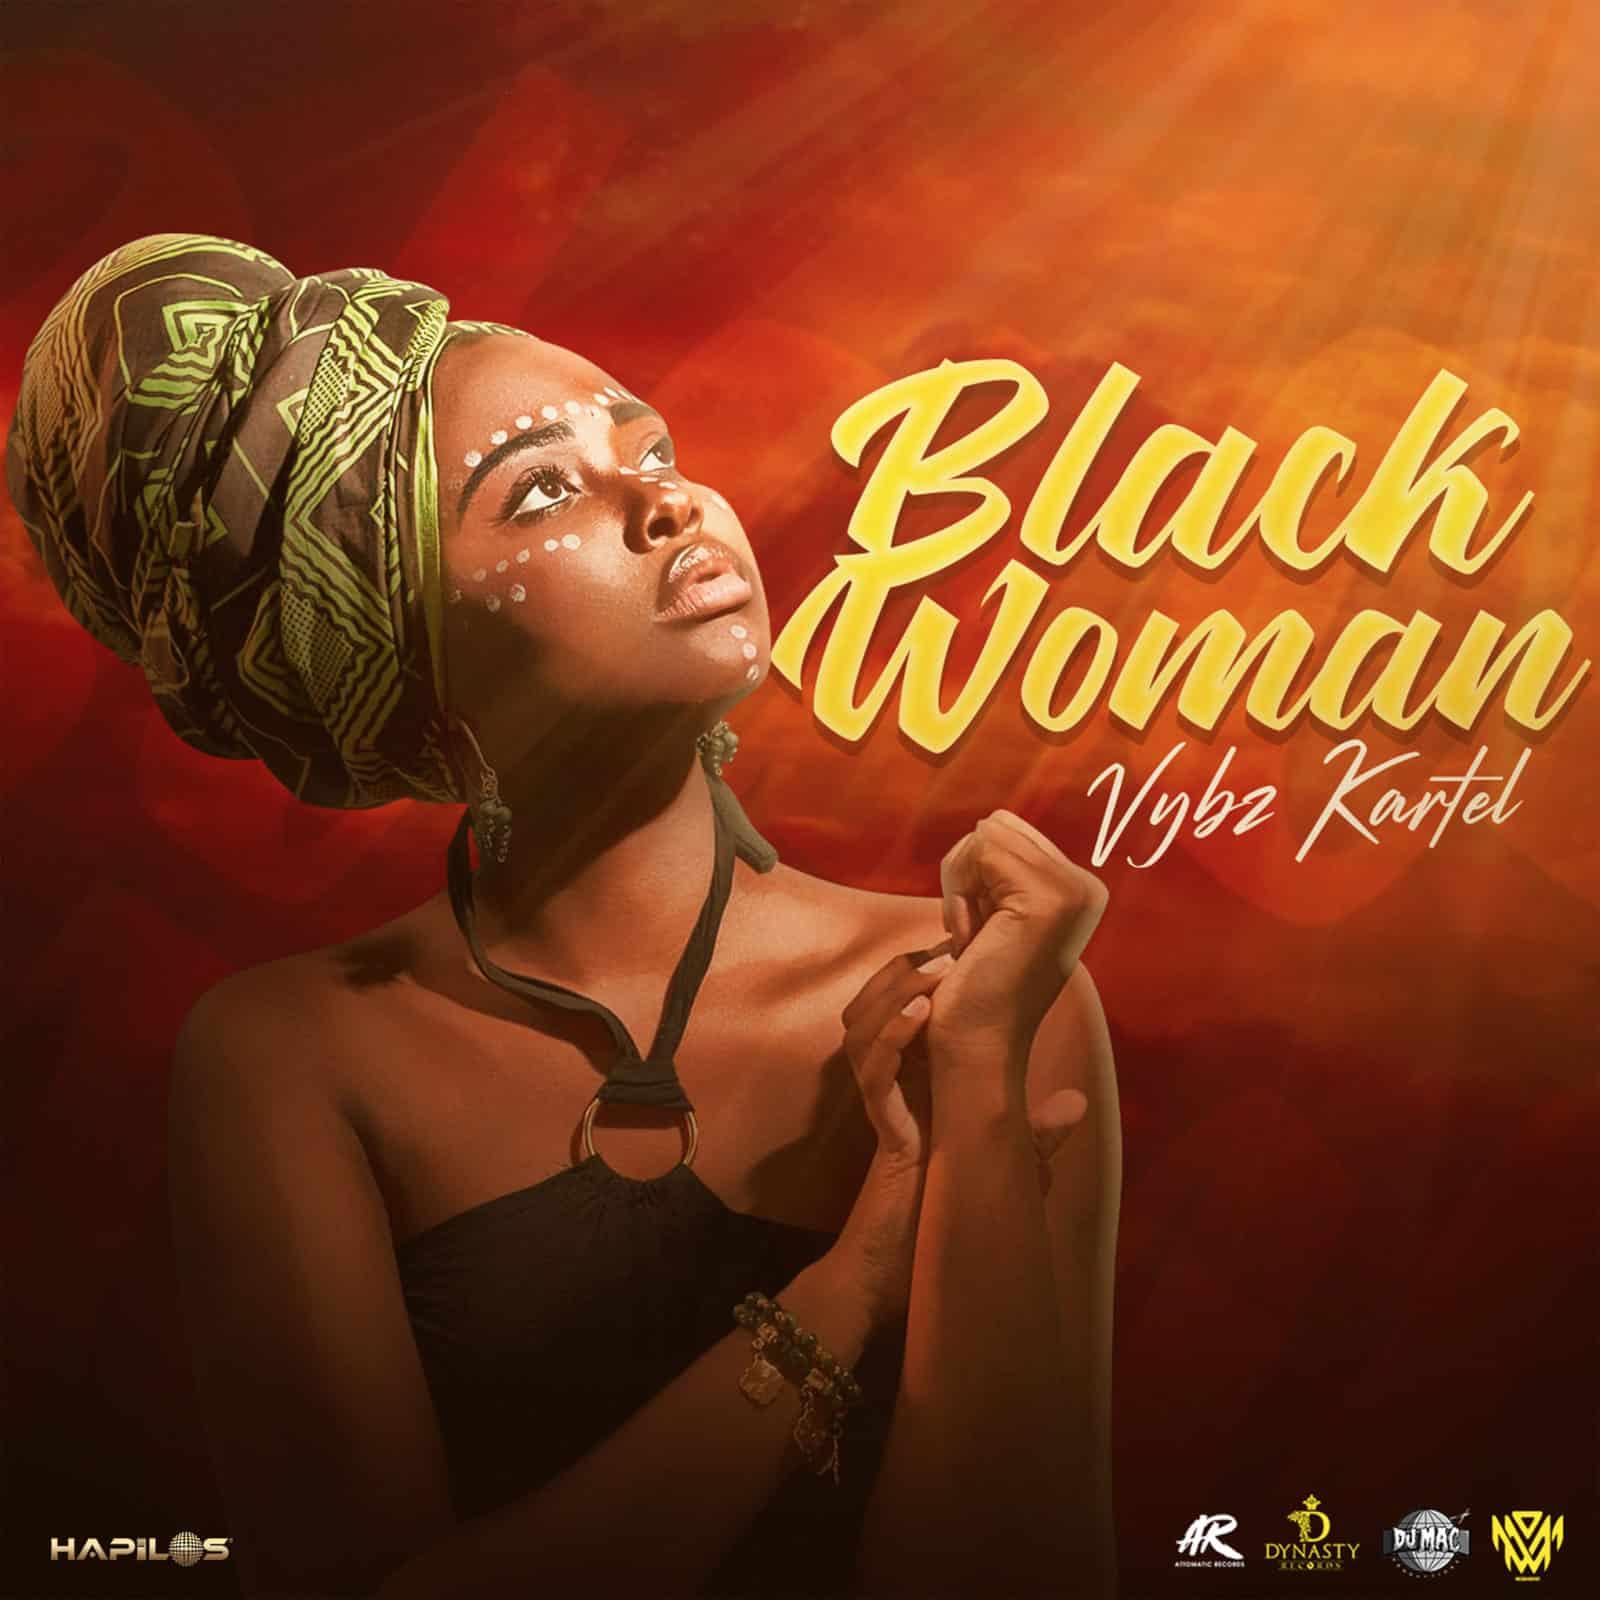 Vybz Kartel - Black Woman - Dynasty Entertainment / Attomatic Records